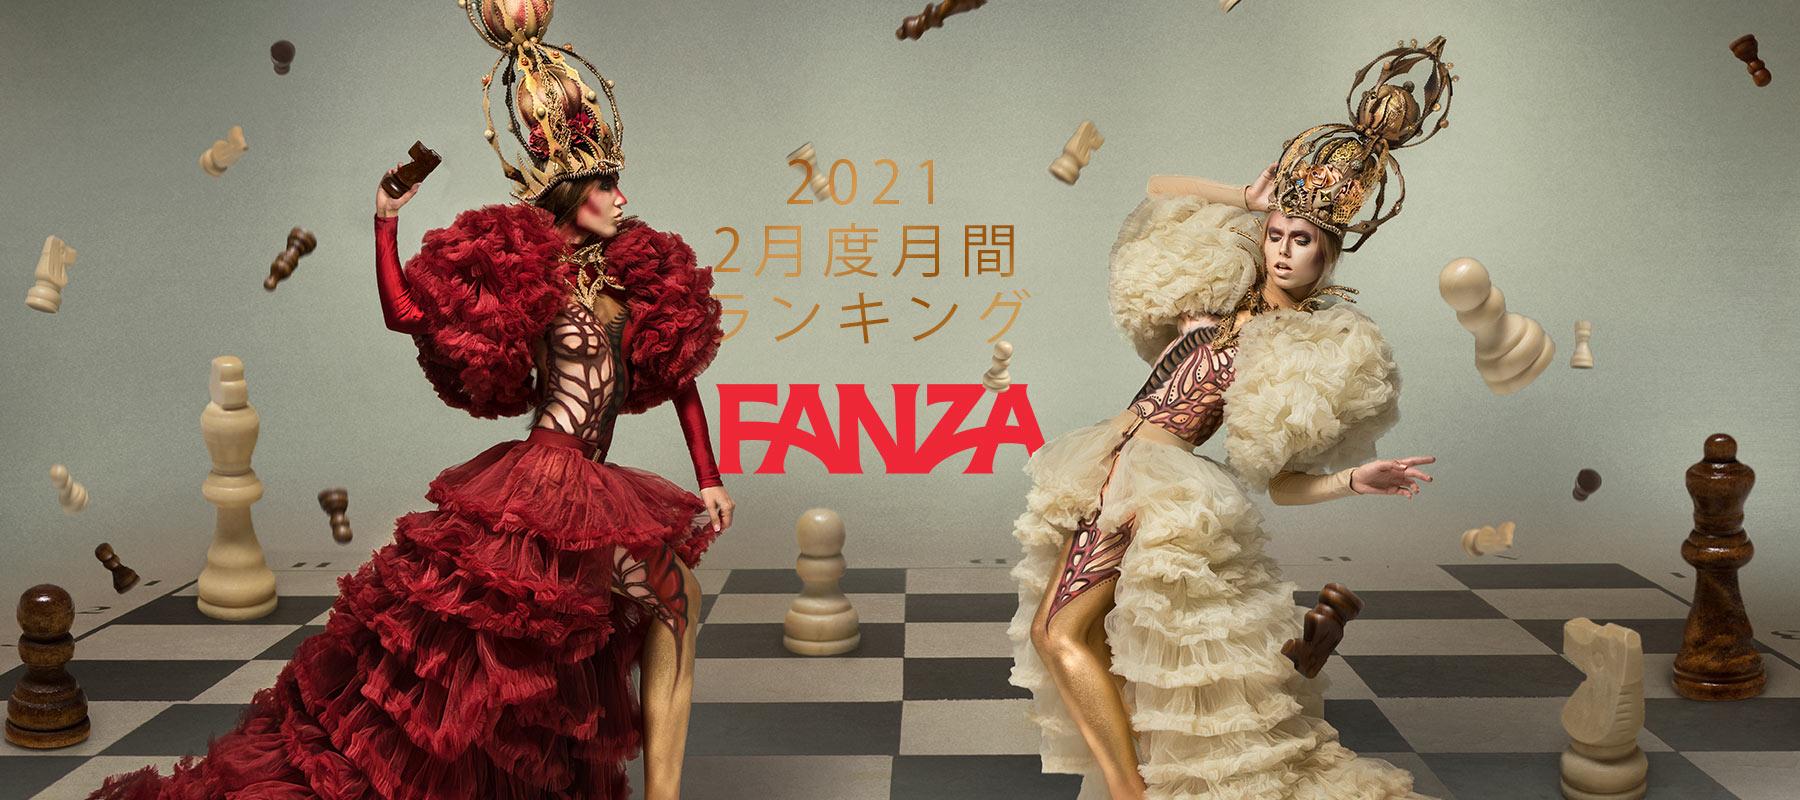 FANZA月間ランキング(2021年2月度)